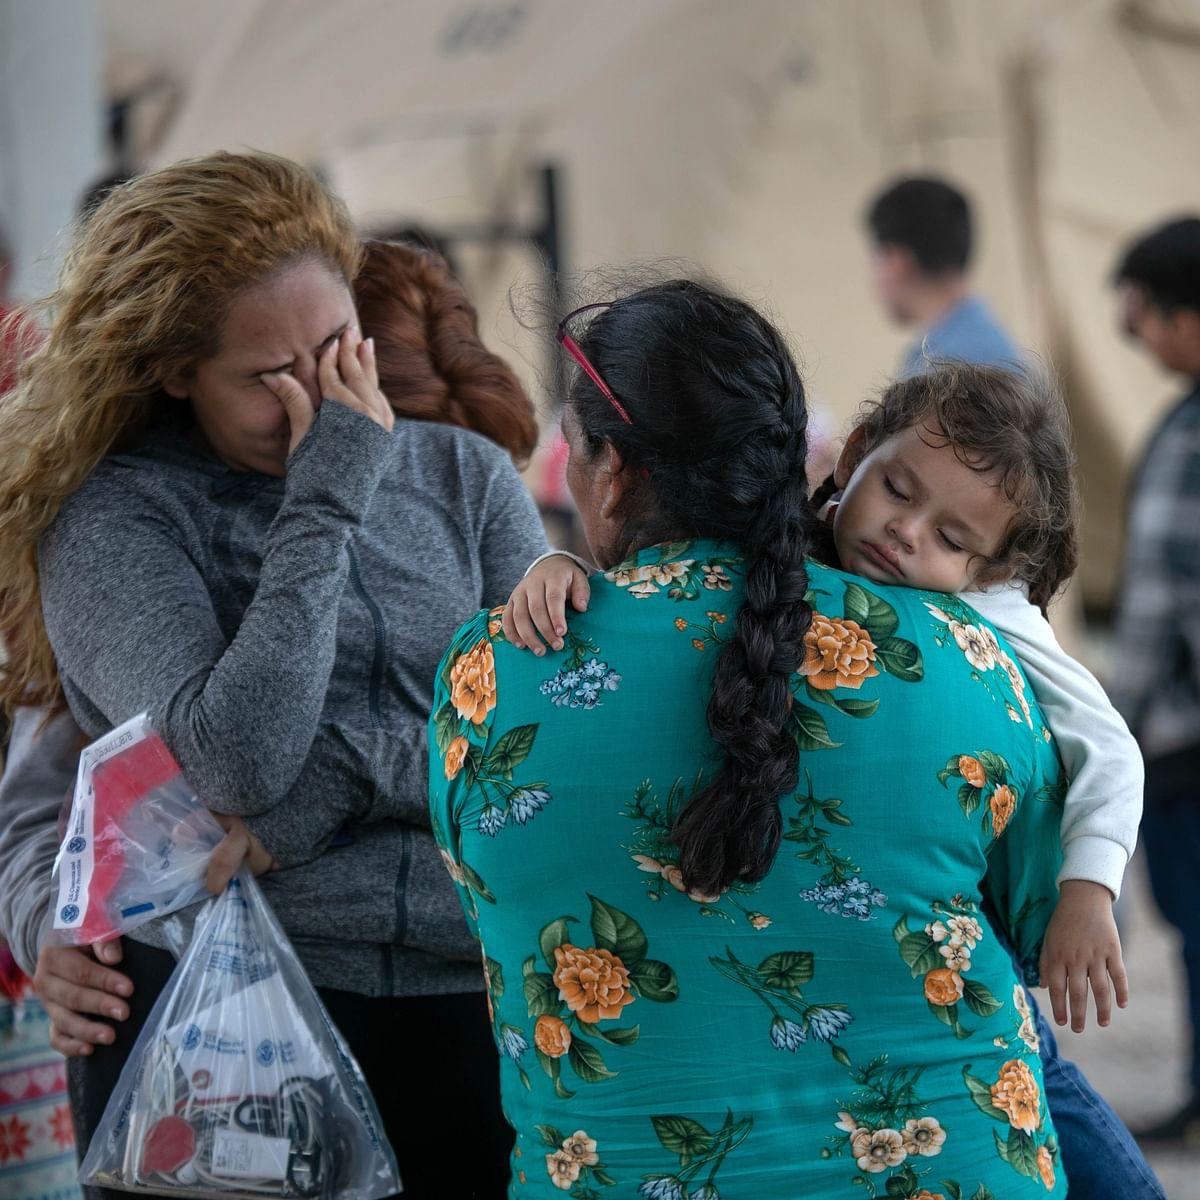 US officials search for Brazilian toddler who fell into Rio Grande